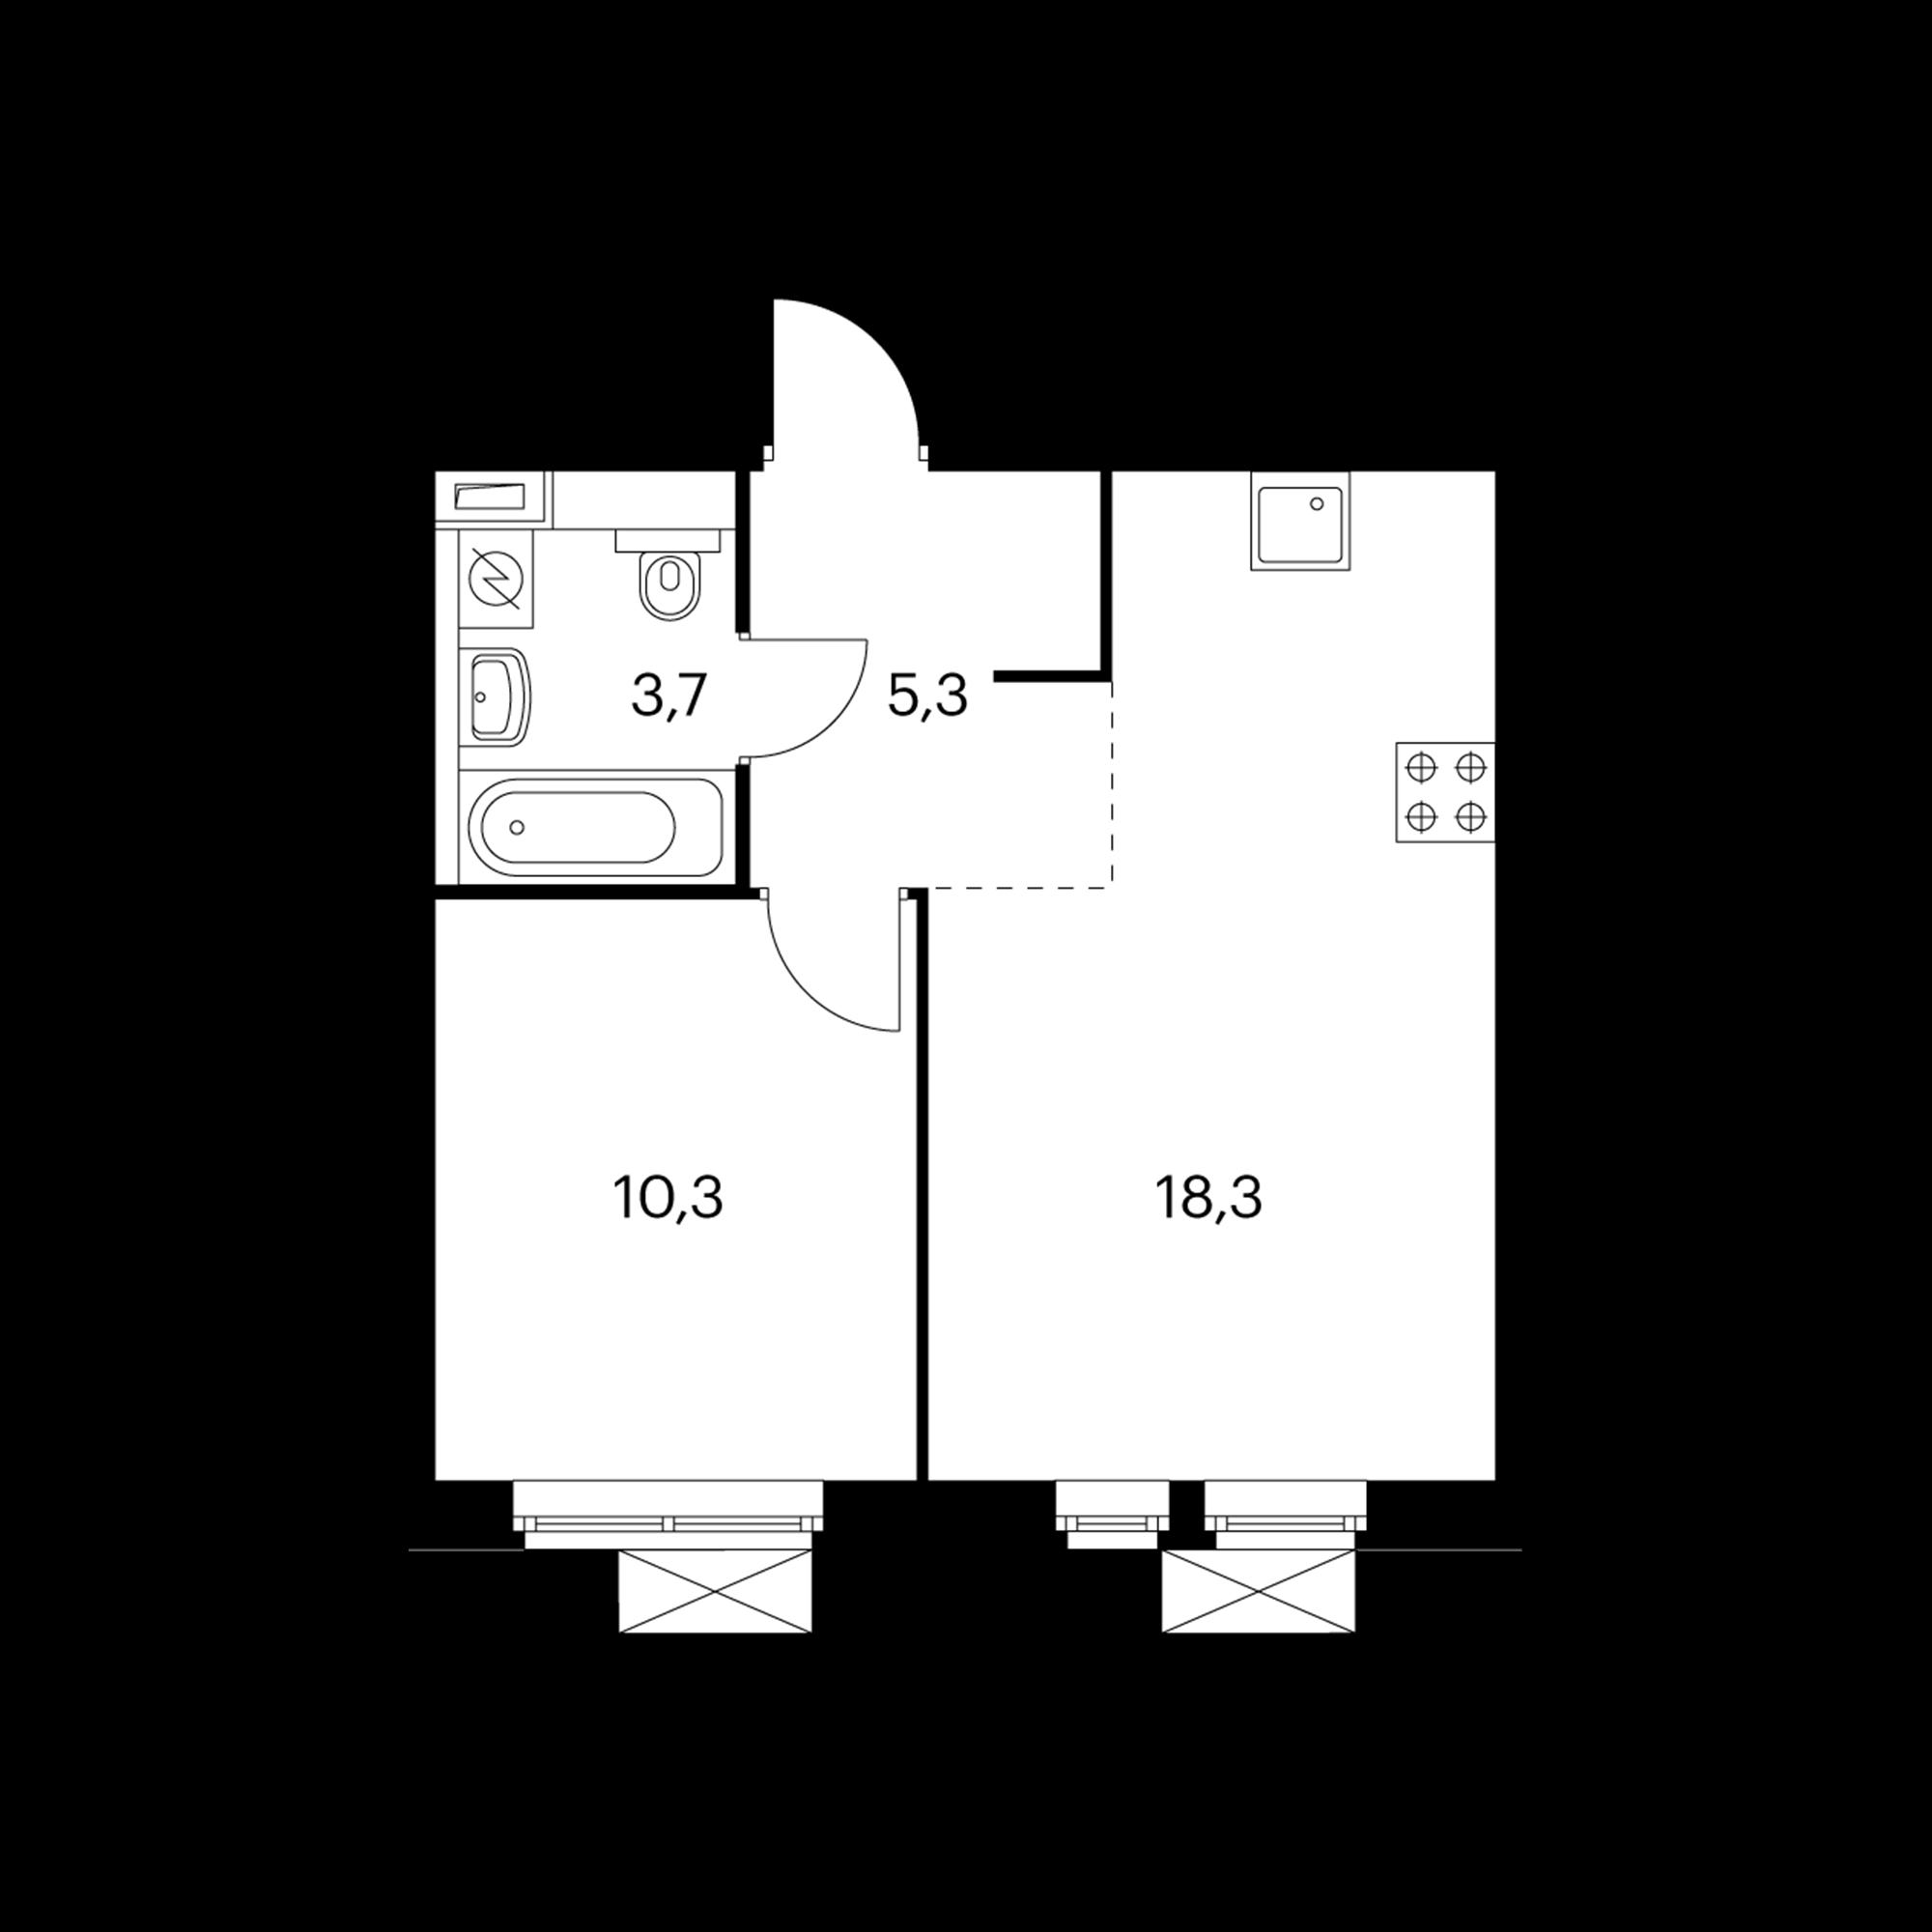 1EM5_6.6-6